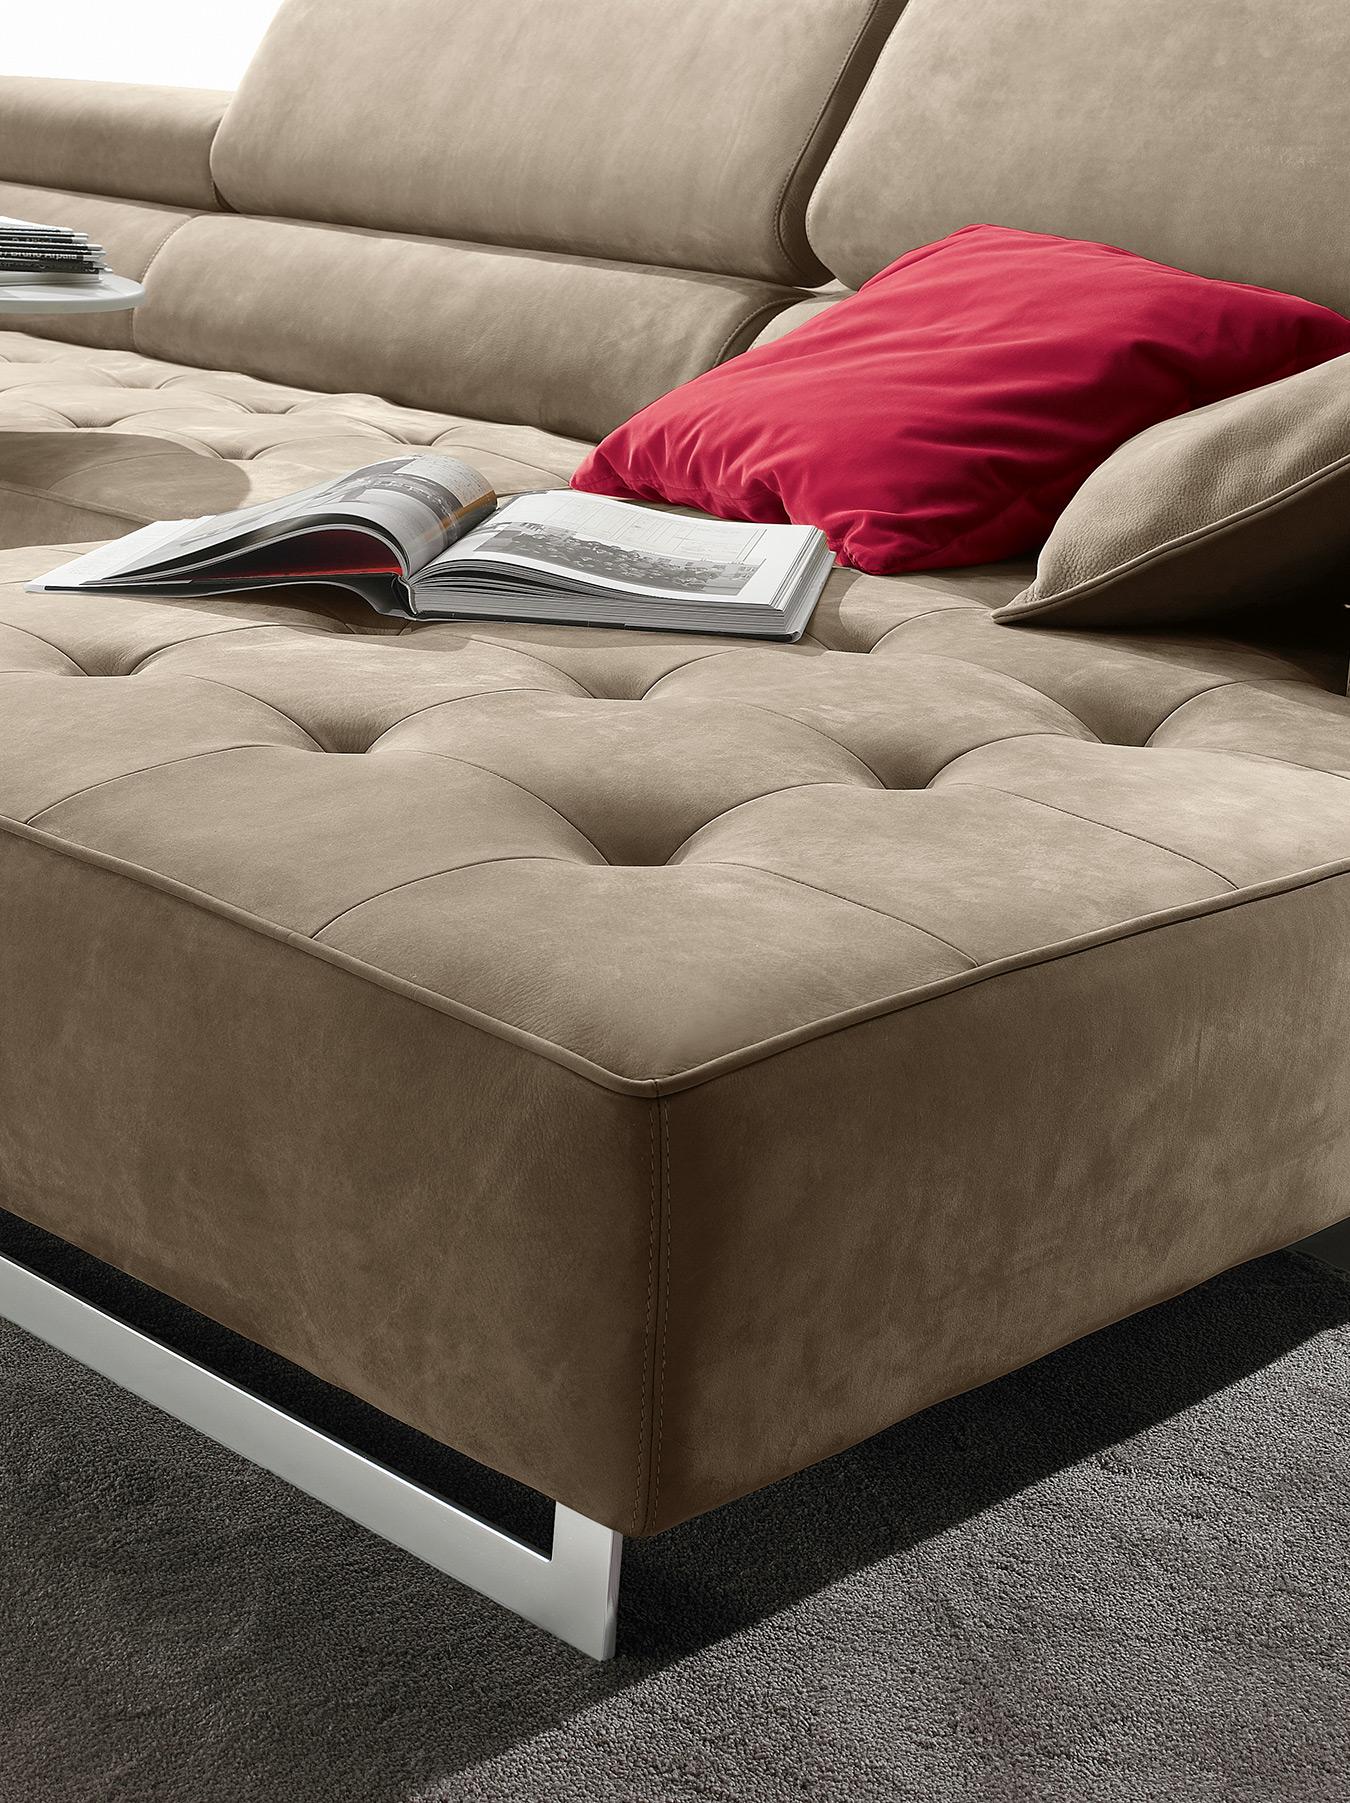 capitone leather beige sofa with silver legs, asimenia podia kapitone kanapes, kafe kanapes me asimenia podia,